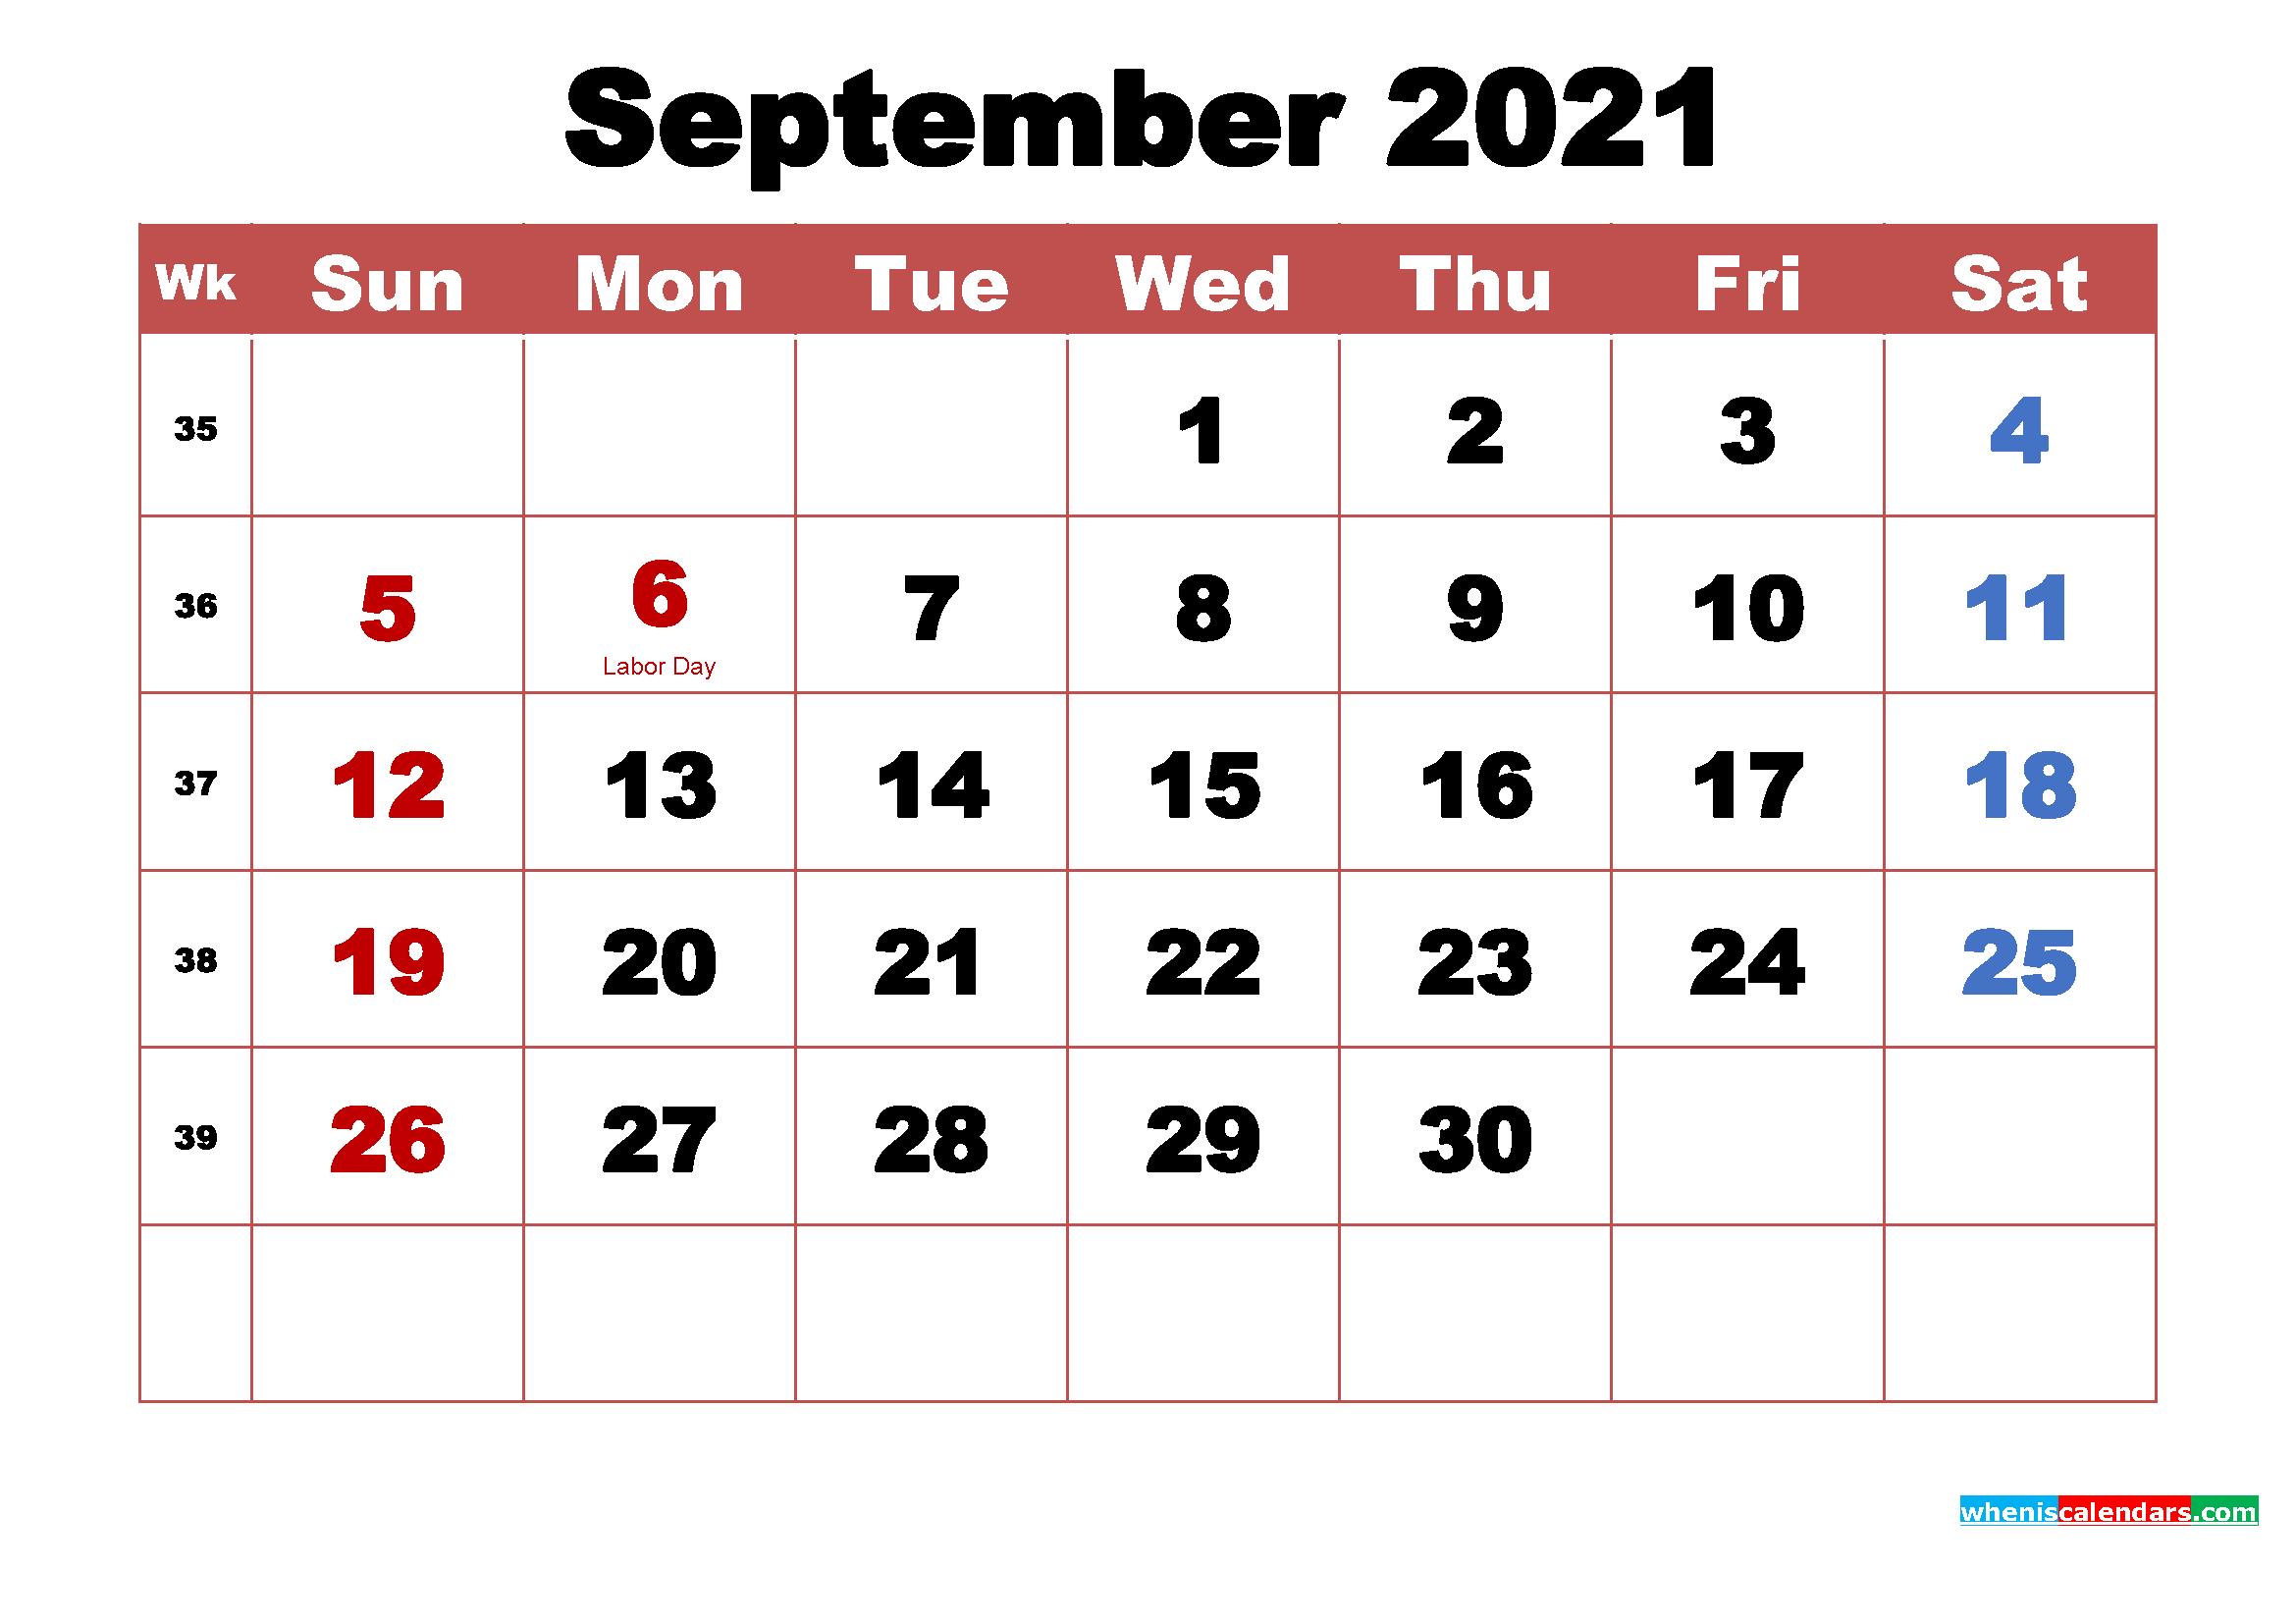 September 2021 Calendar With Holidays Printable | Free